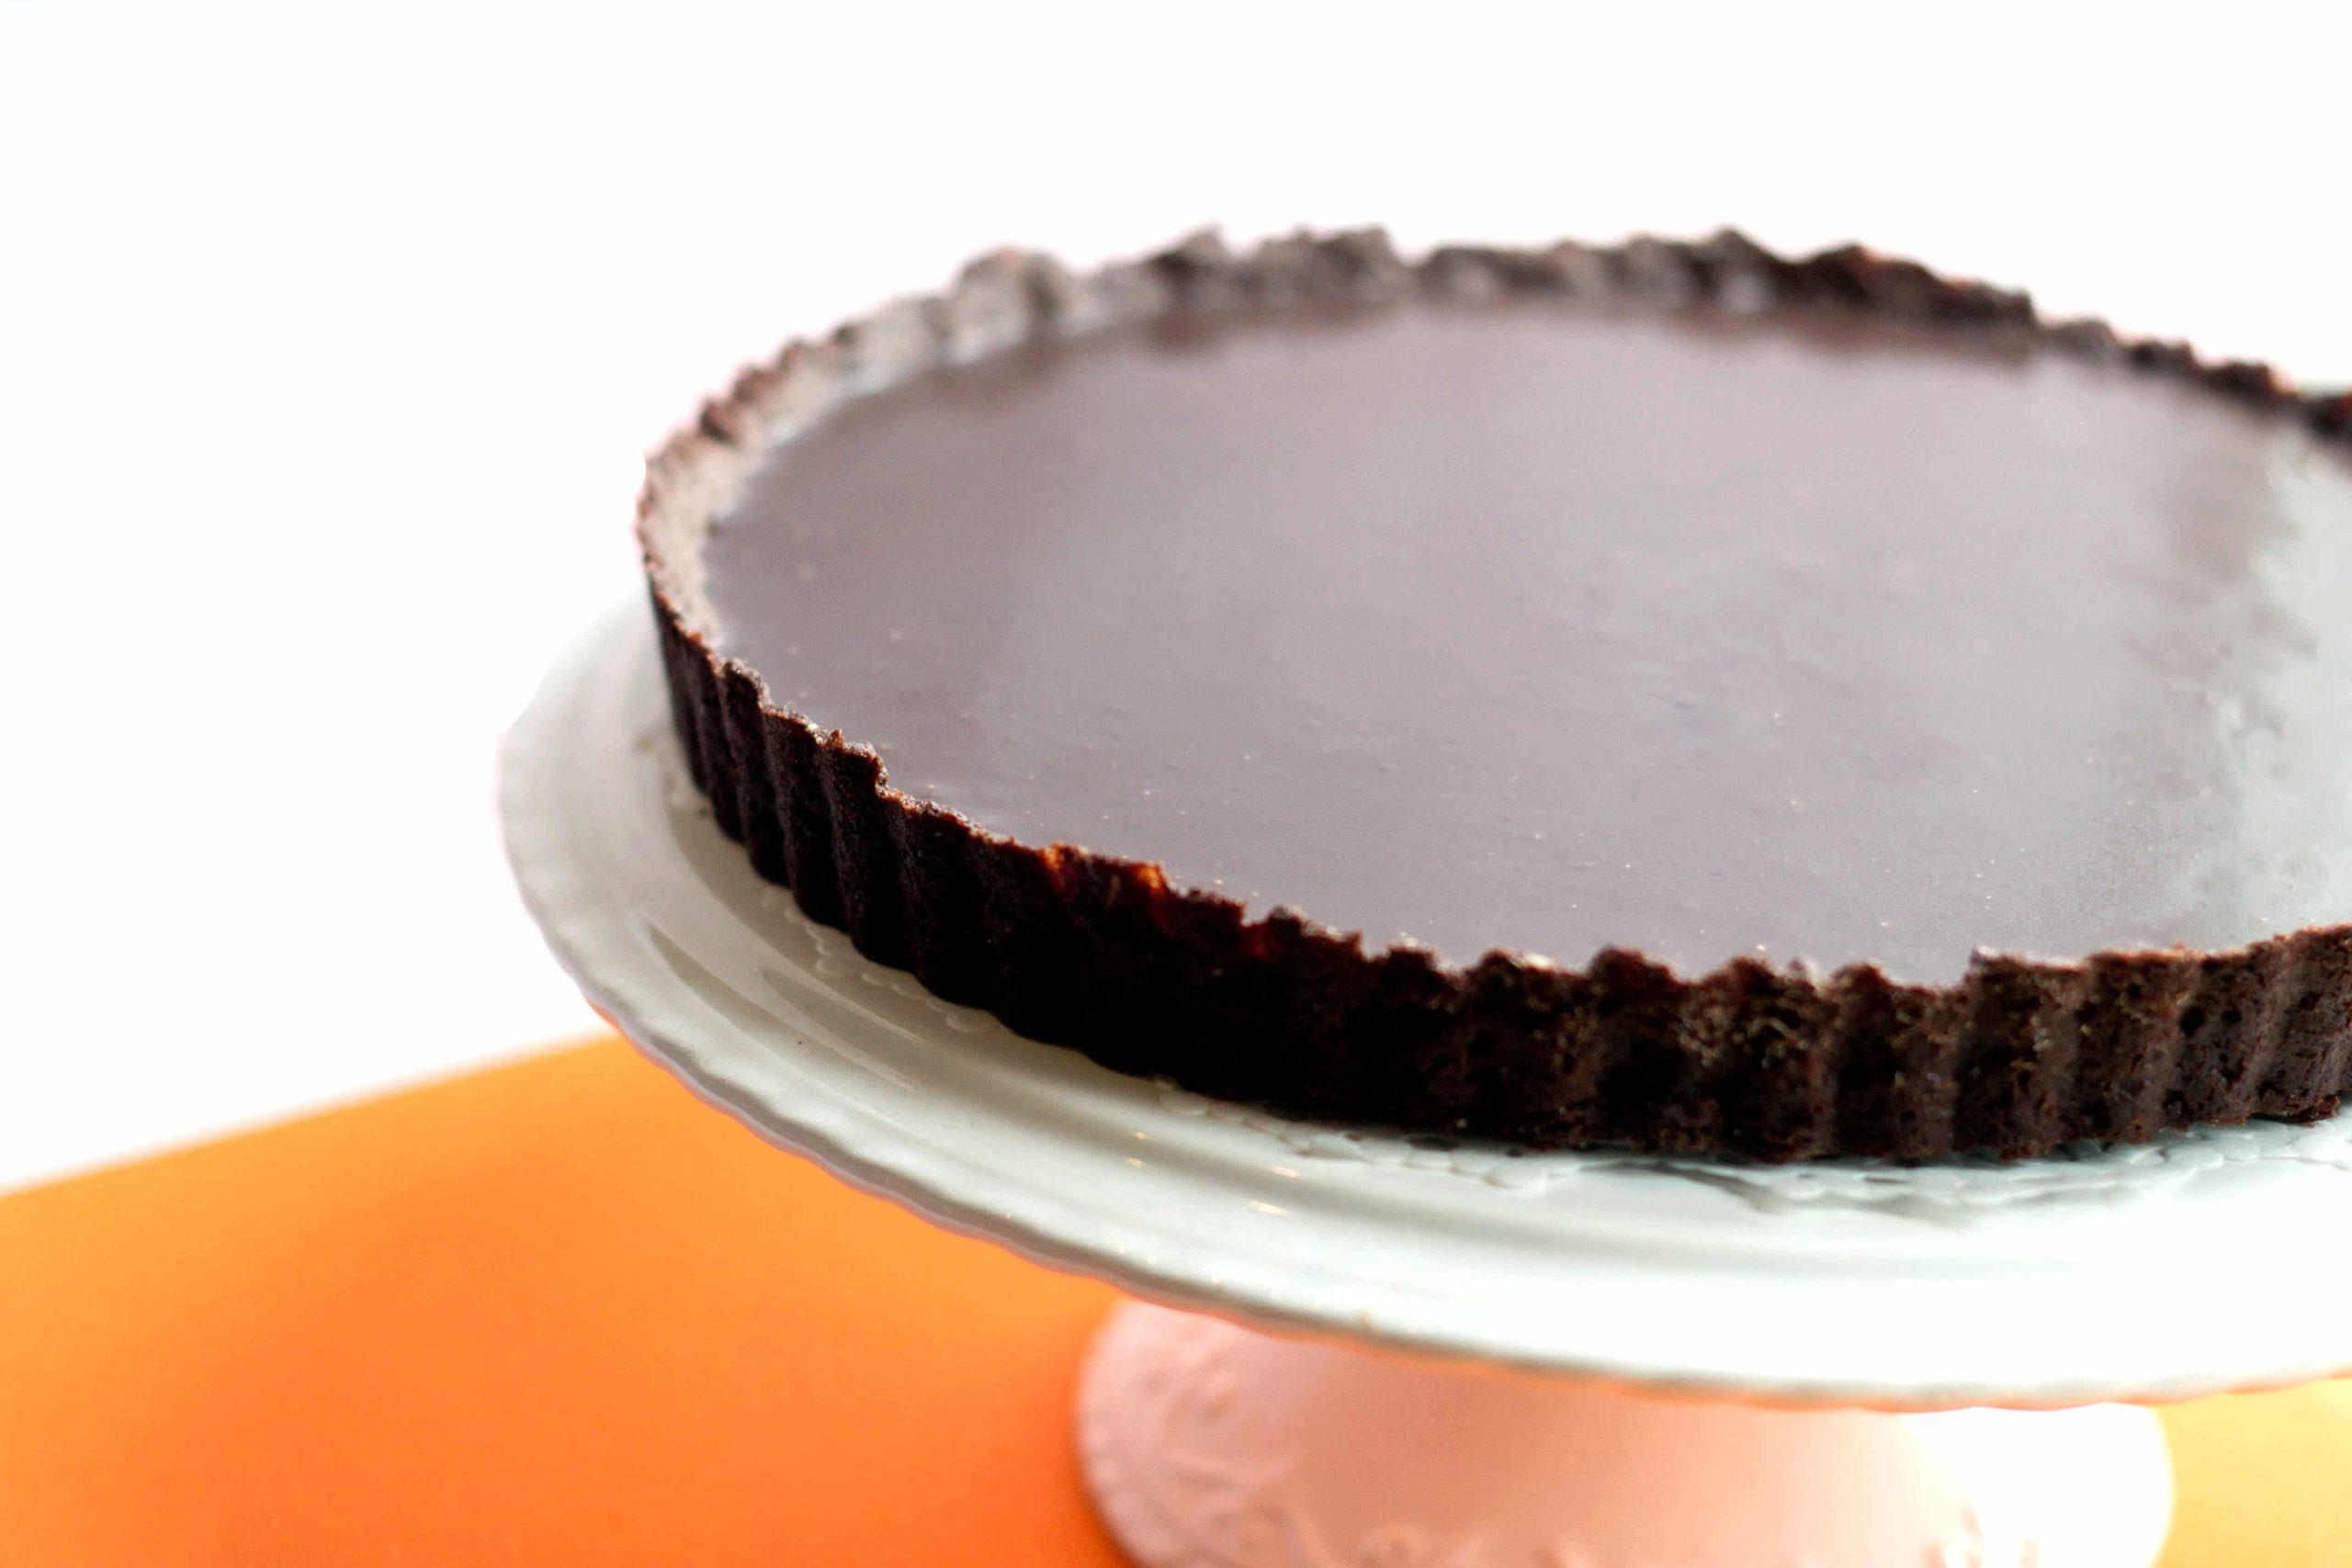 dark chocolate silk tart on a cake stand, undecorated